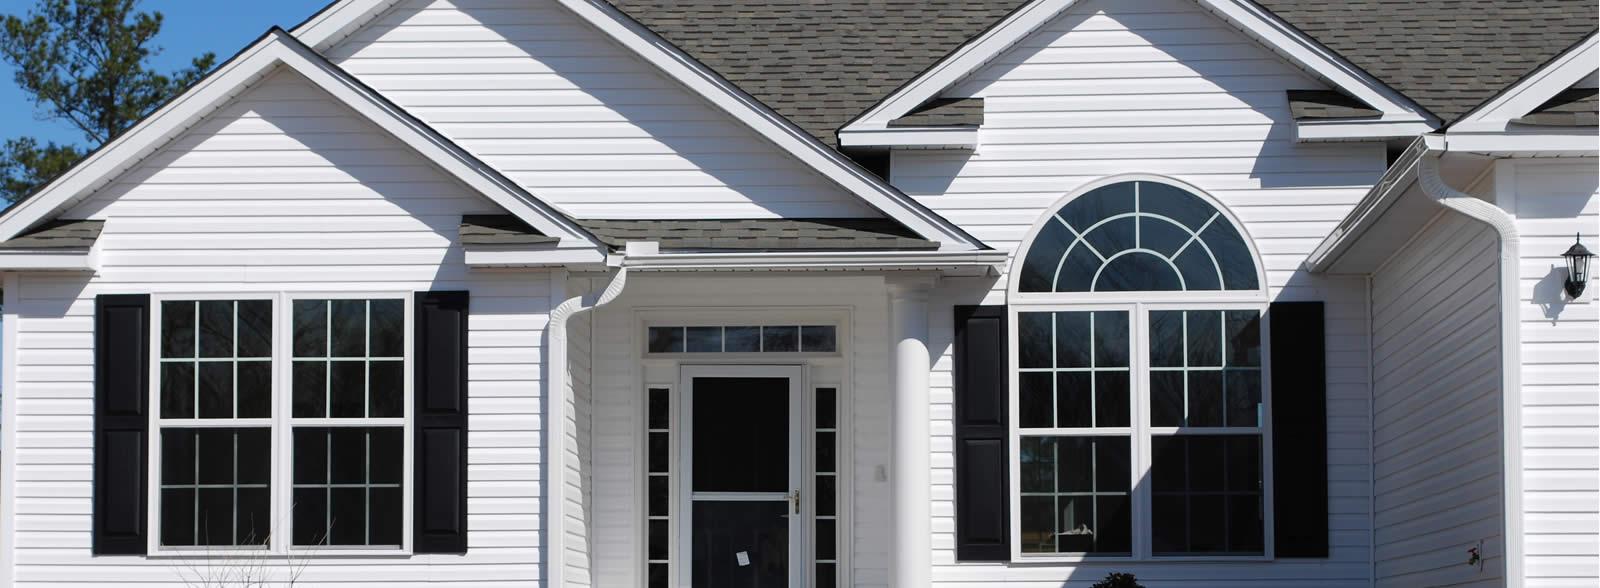 Superior Exterior Home Improvement Services